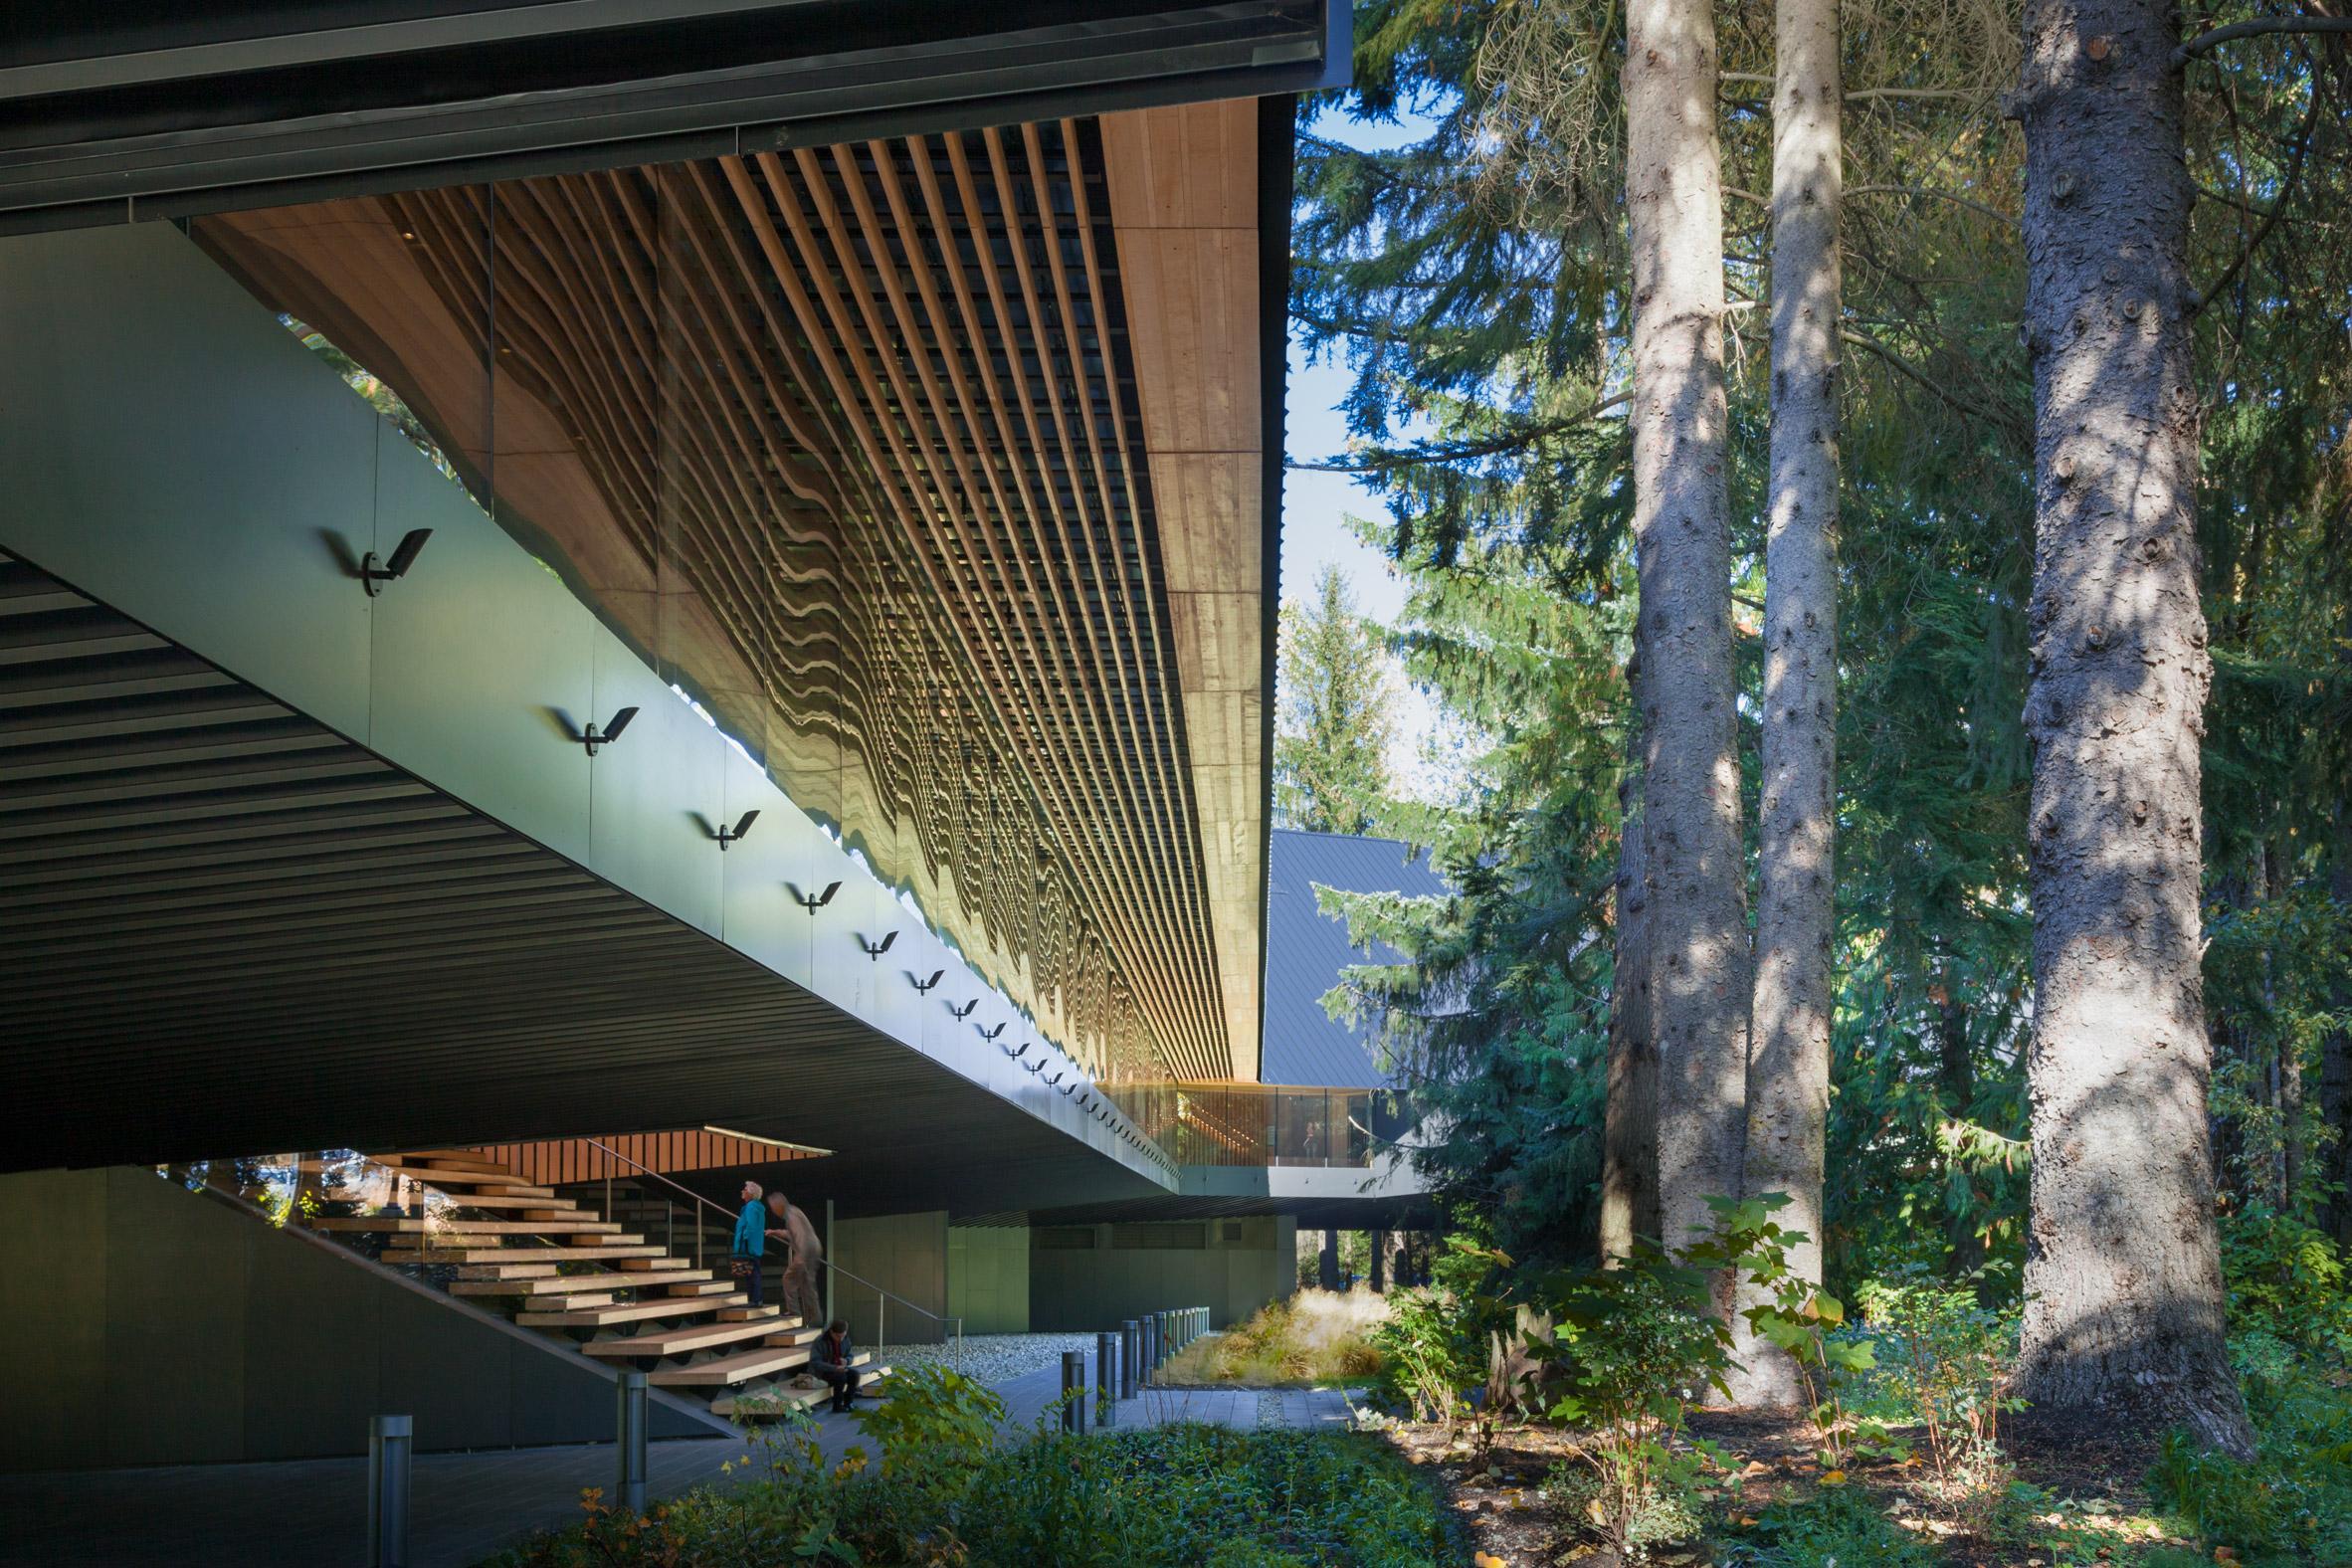 Audain Art Museum by Patkau Architects